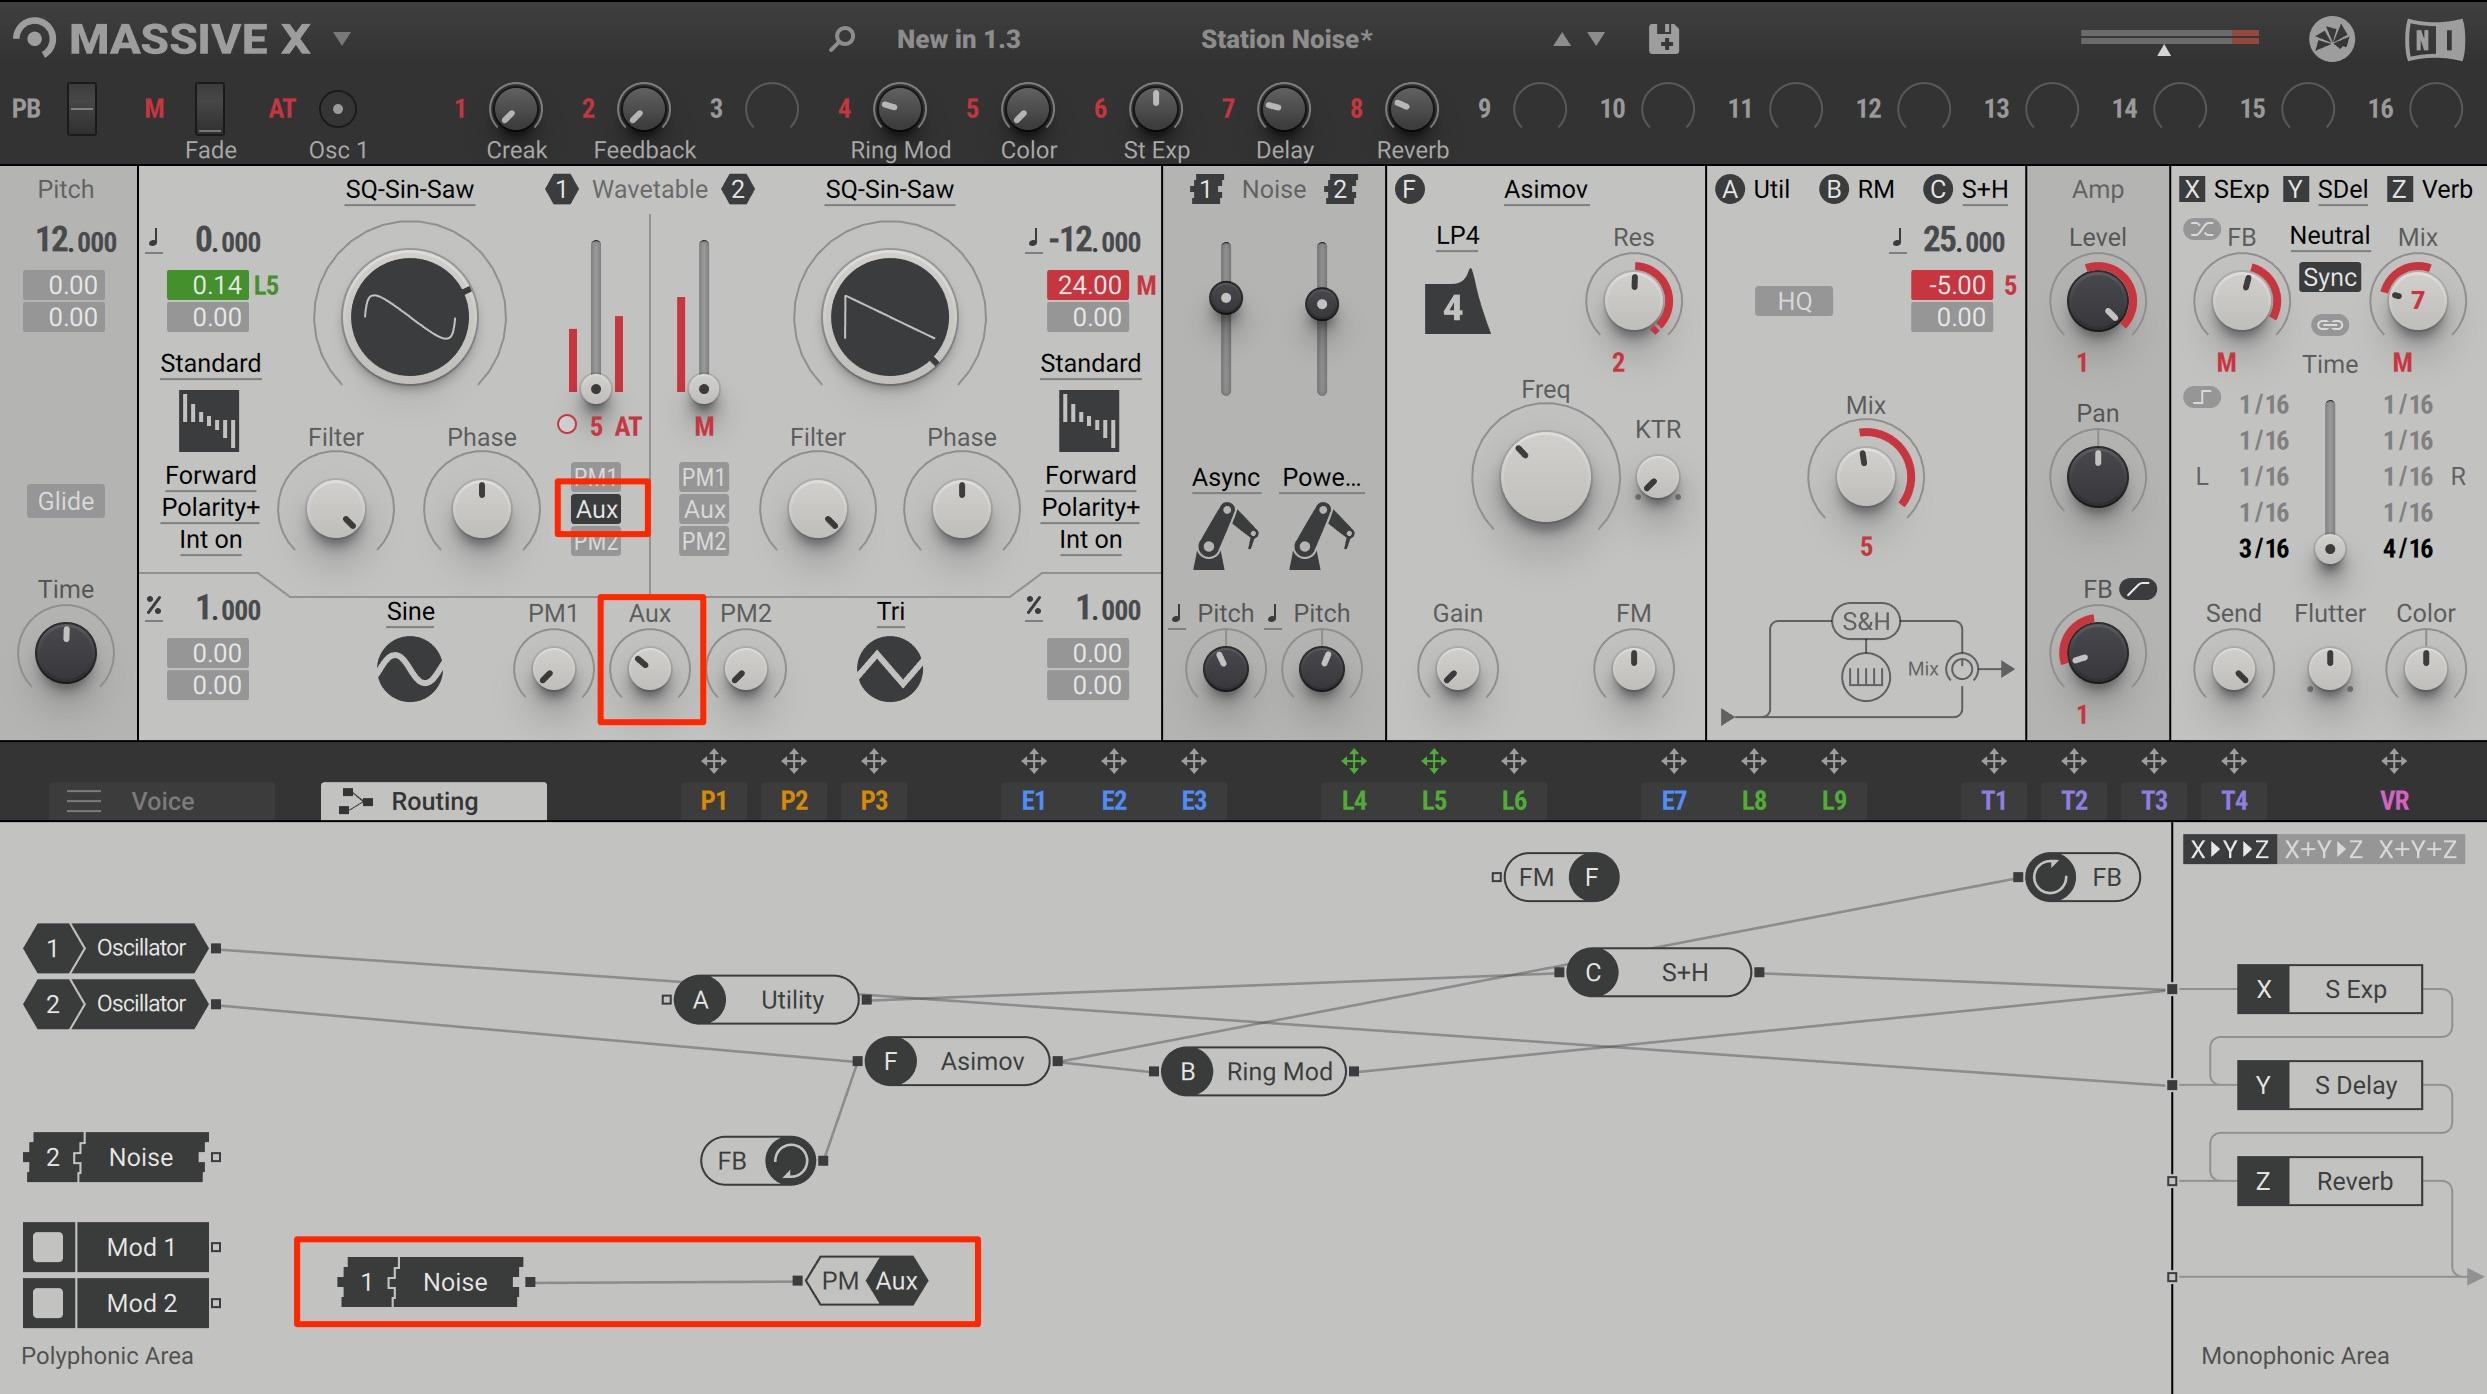 Noise_Modulator